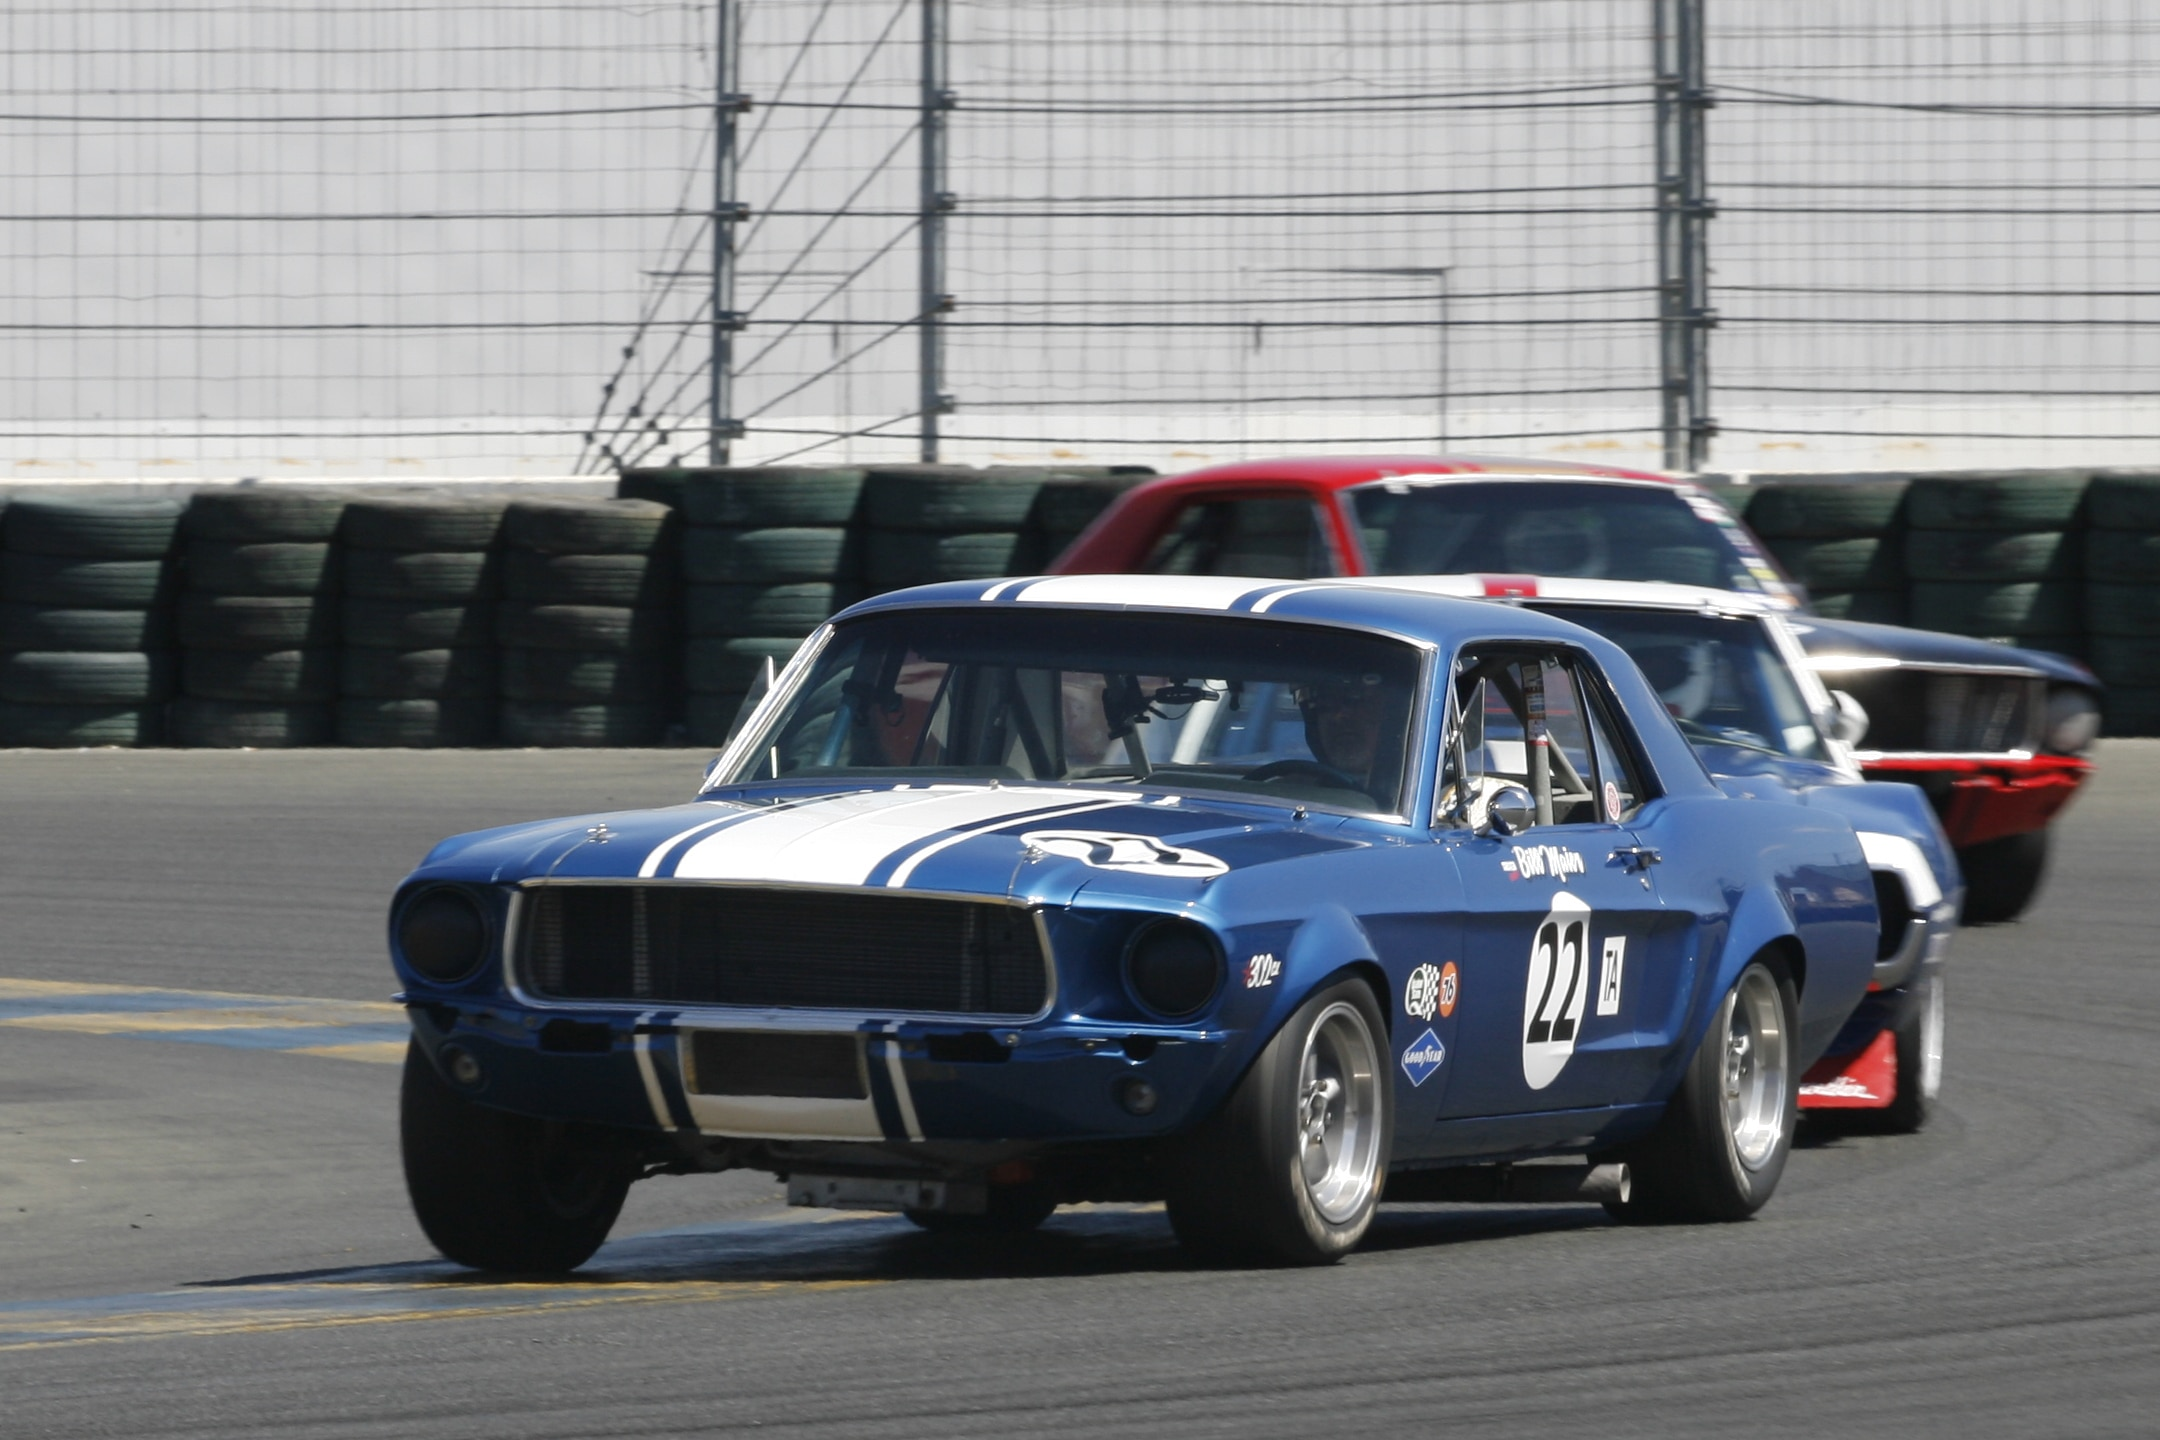 Blue White Vintage Mustang